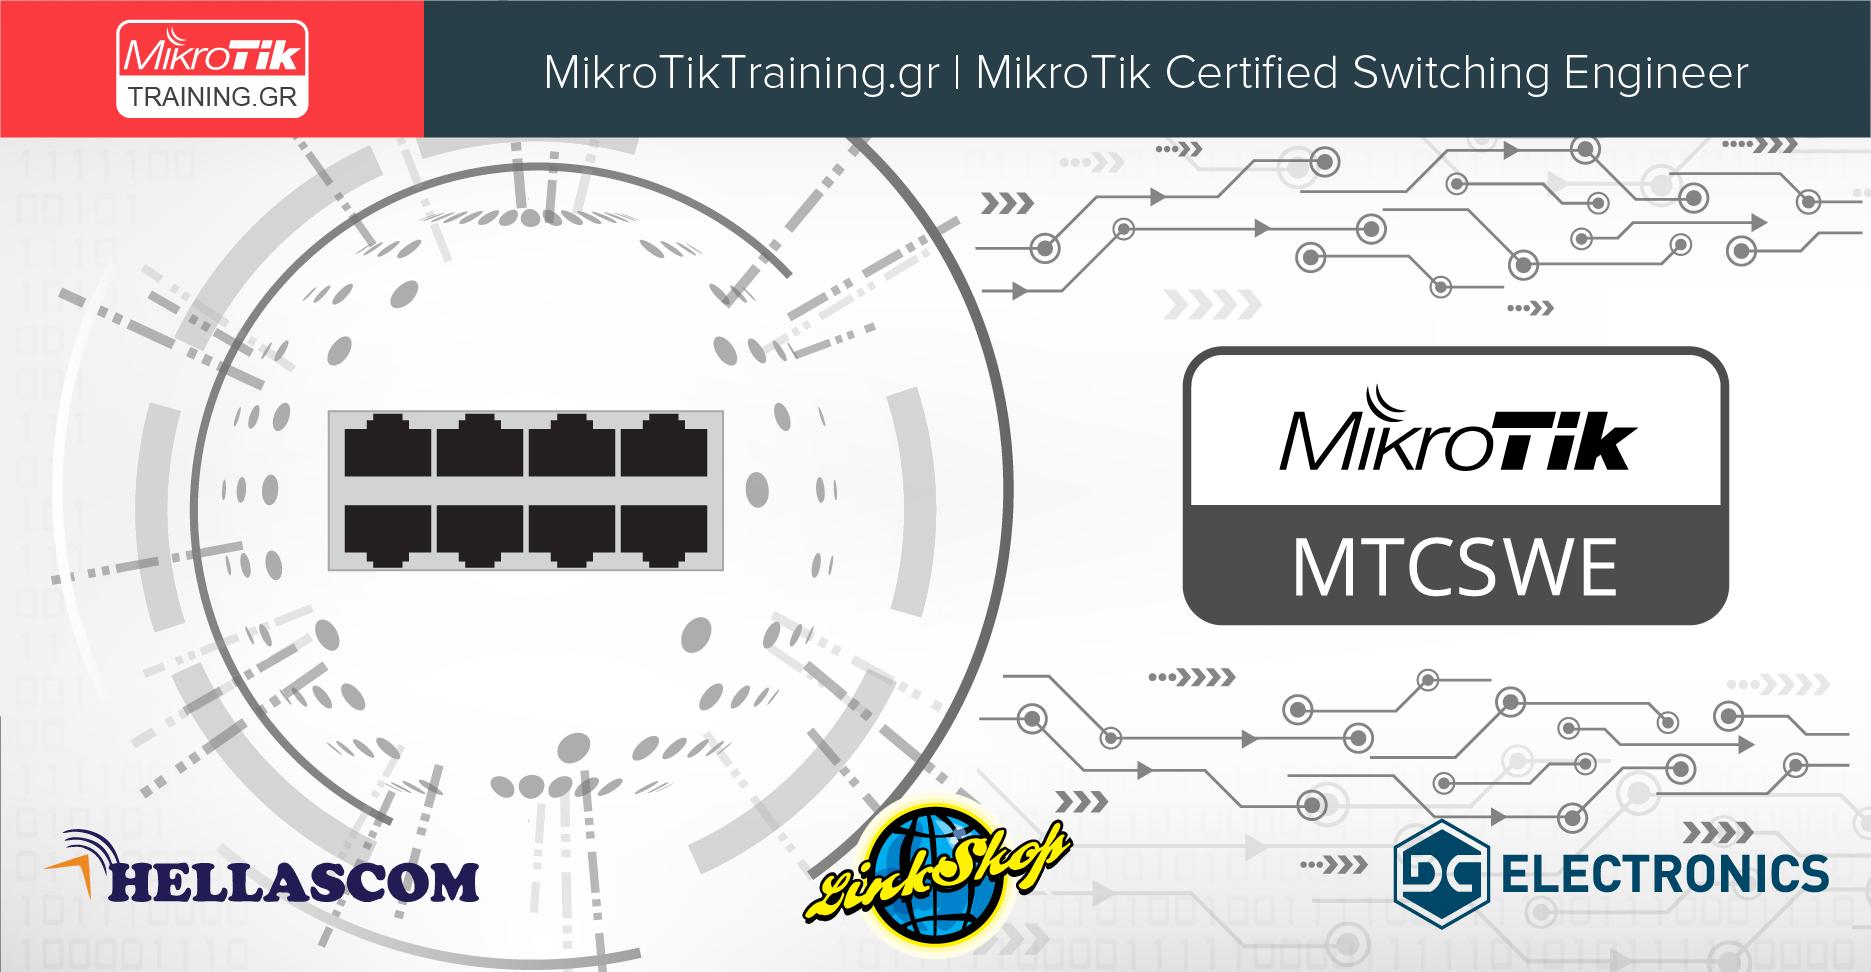 MTCSWE – MikroTik Certified Switching Engineer (15 – 17 Ιανουαρίου 2021) Πειραιάς